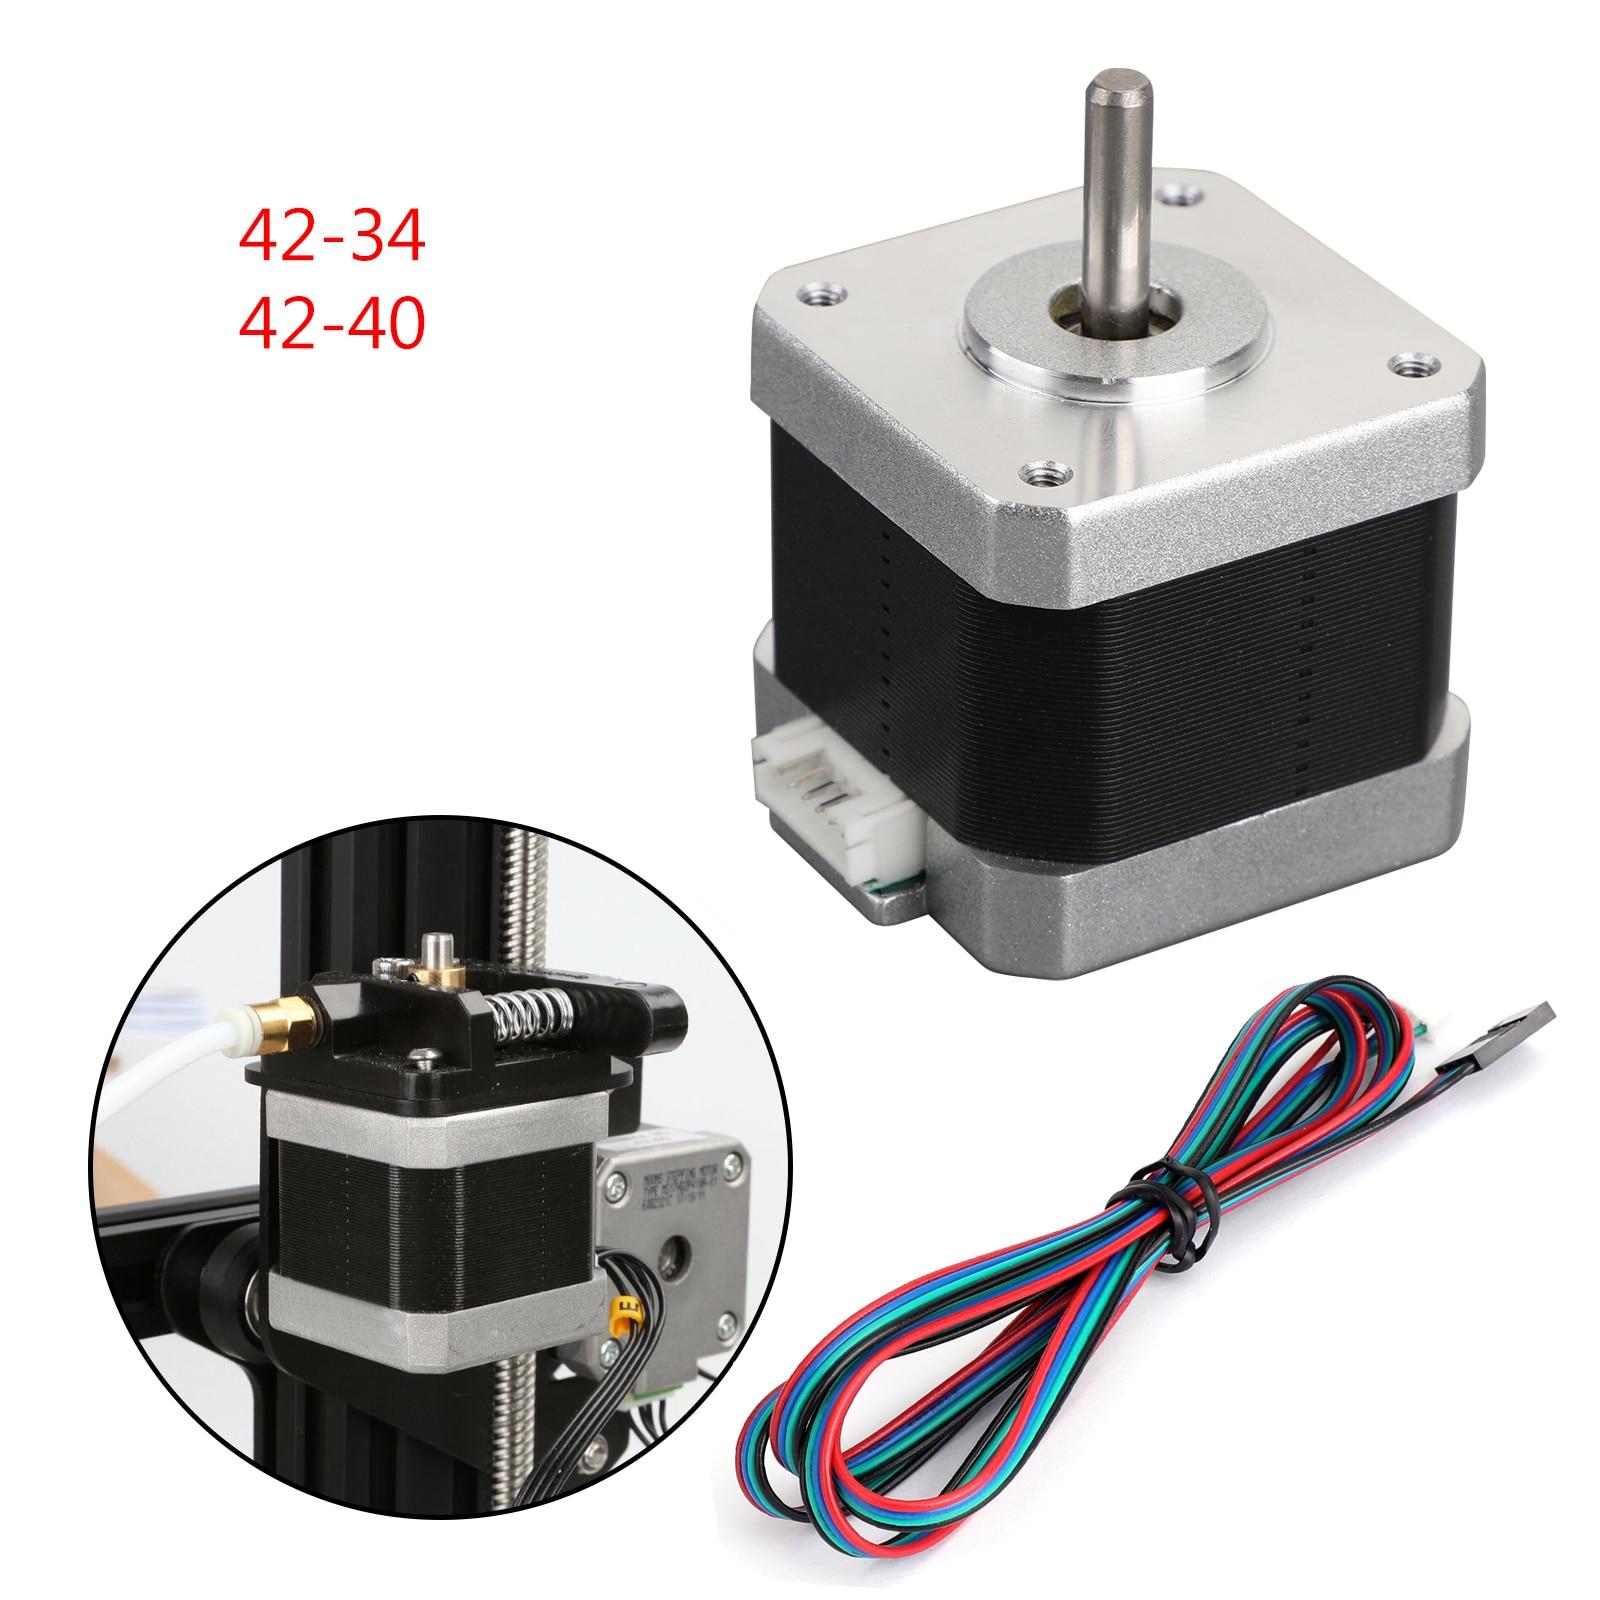 3D принтер Areyourshop, 42, 40, 42, 34 X/Y/Z/E шаговый двигатель для 3D Creality Ender 3 Pro, CR-10